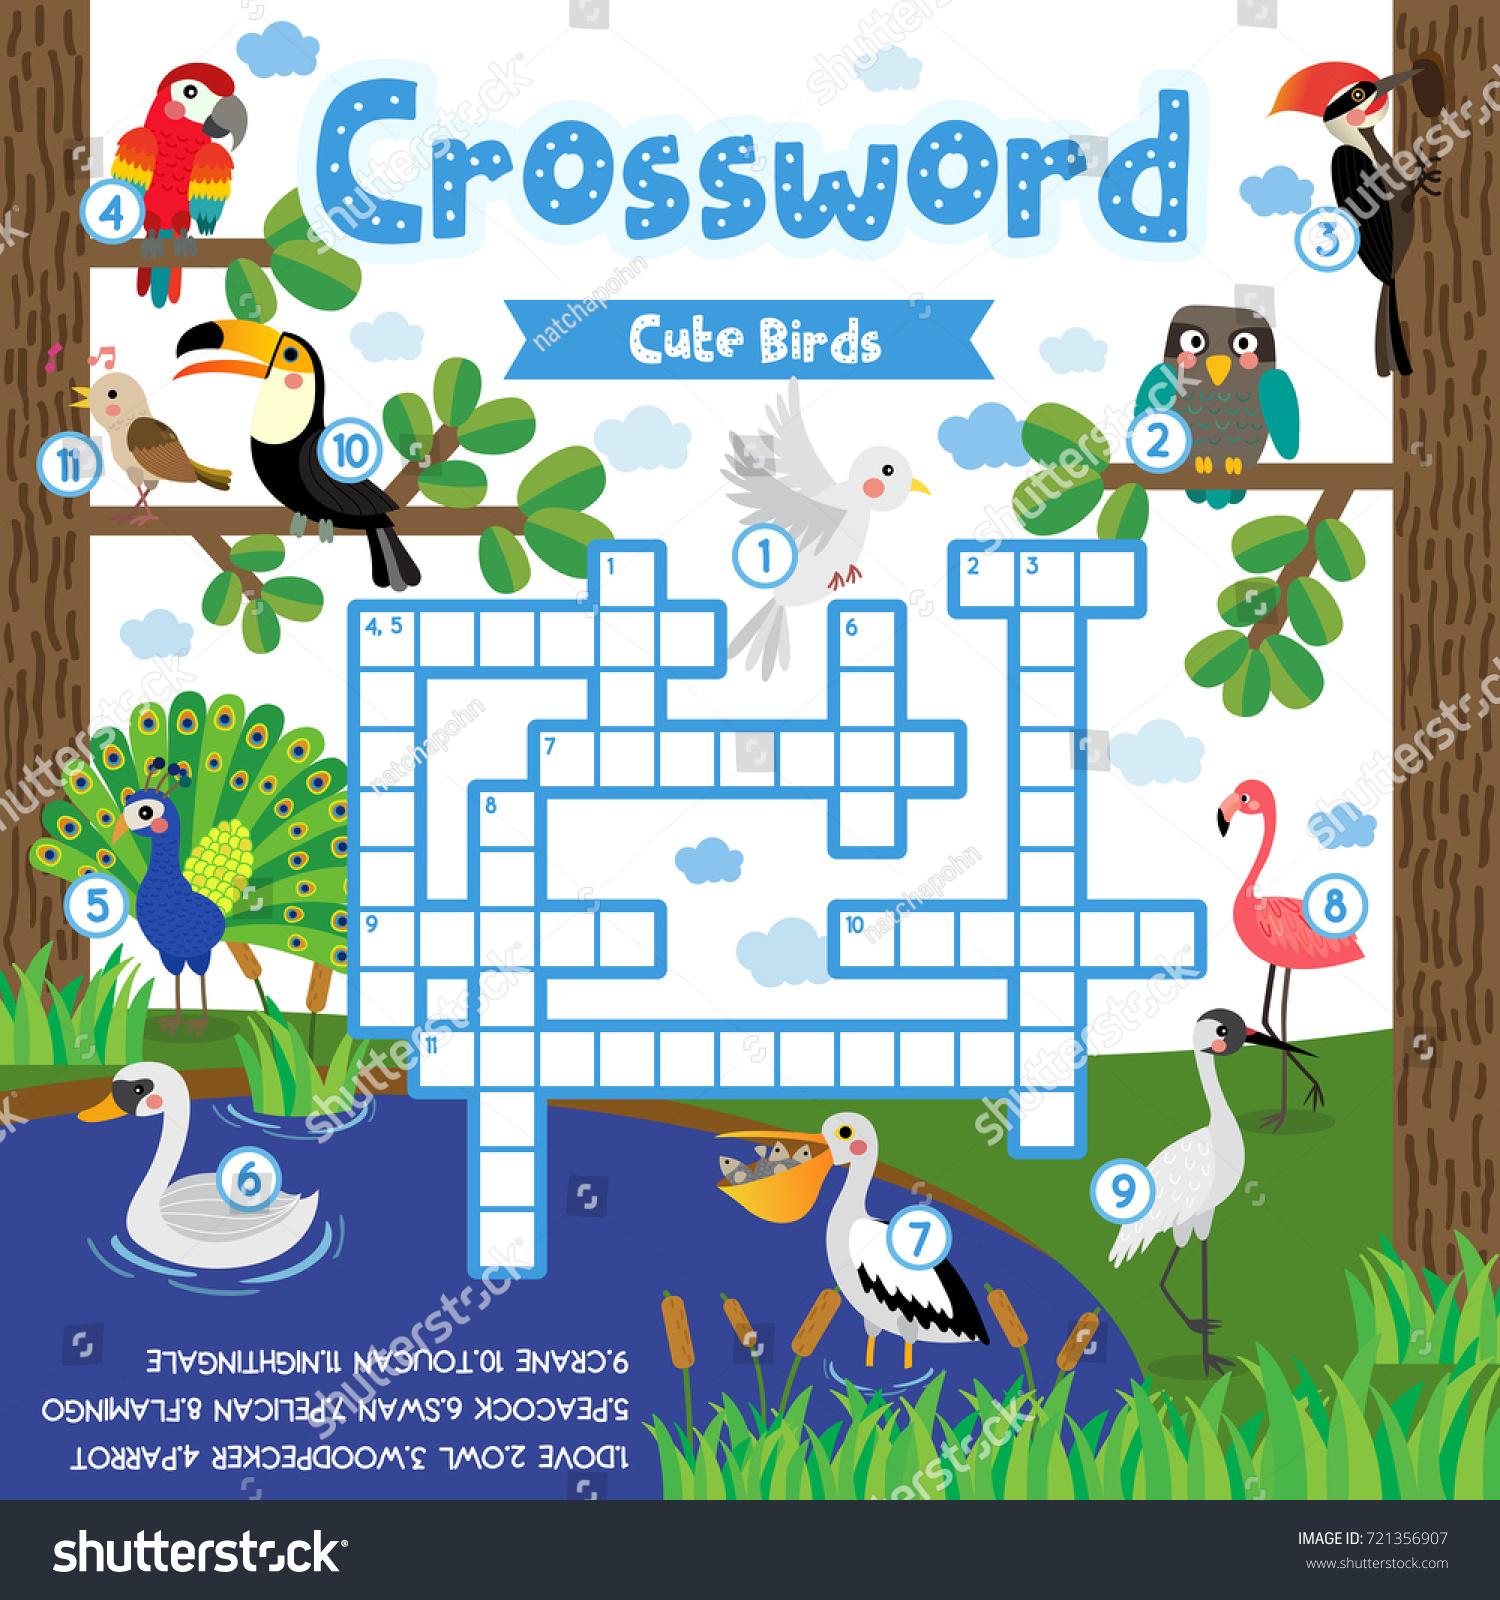 Crosswords Puzzle Game Cute Birds Animals Stock Vector